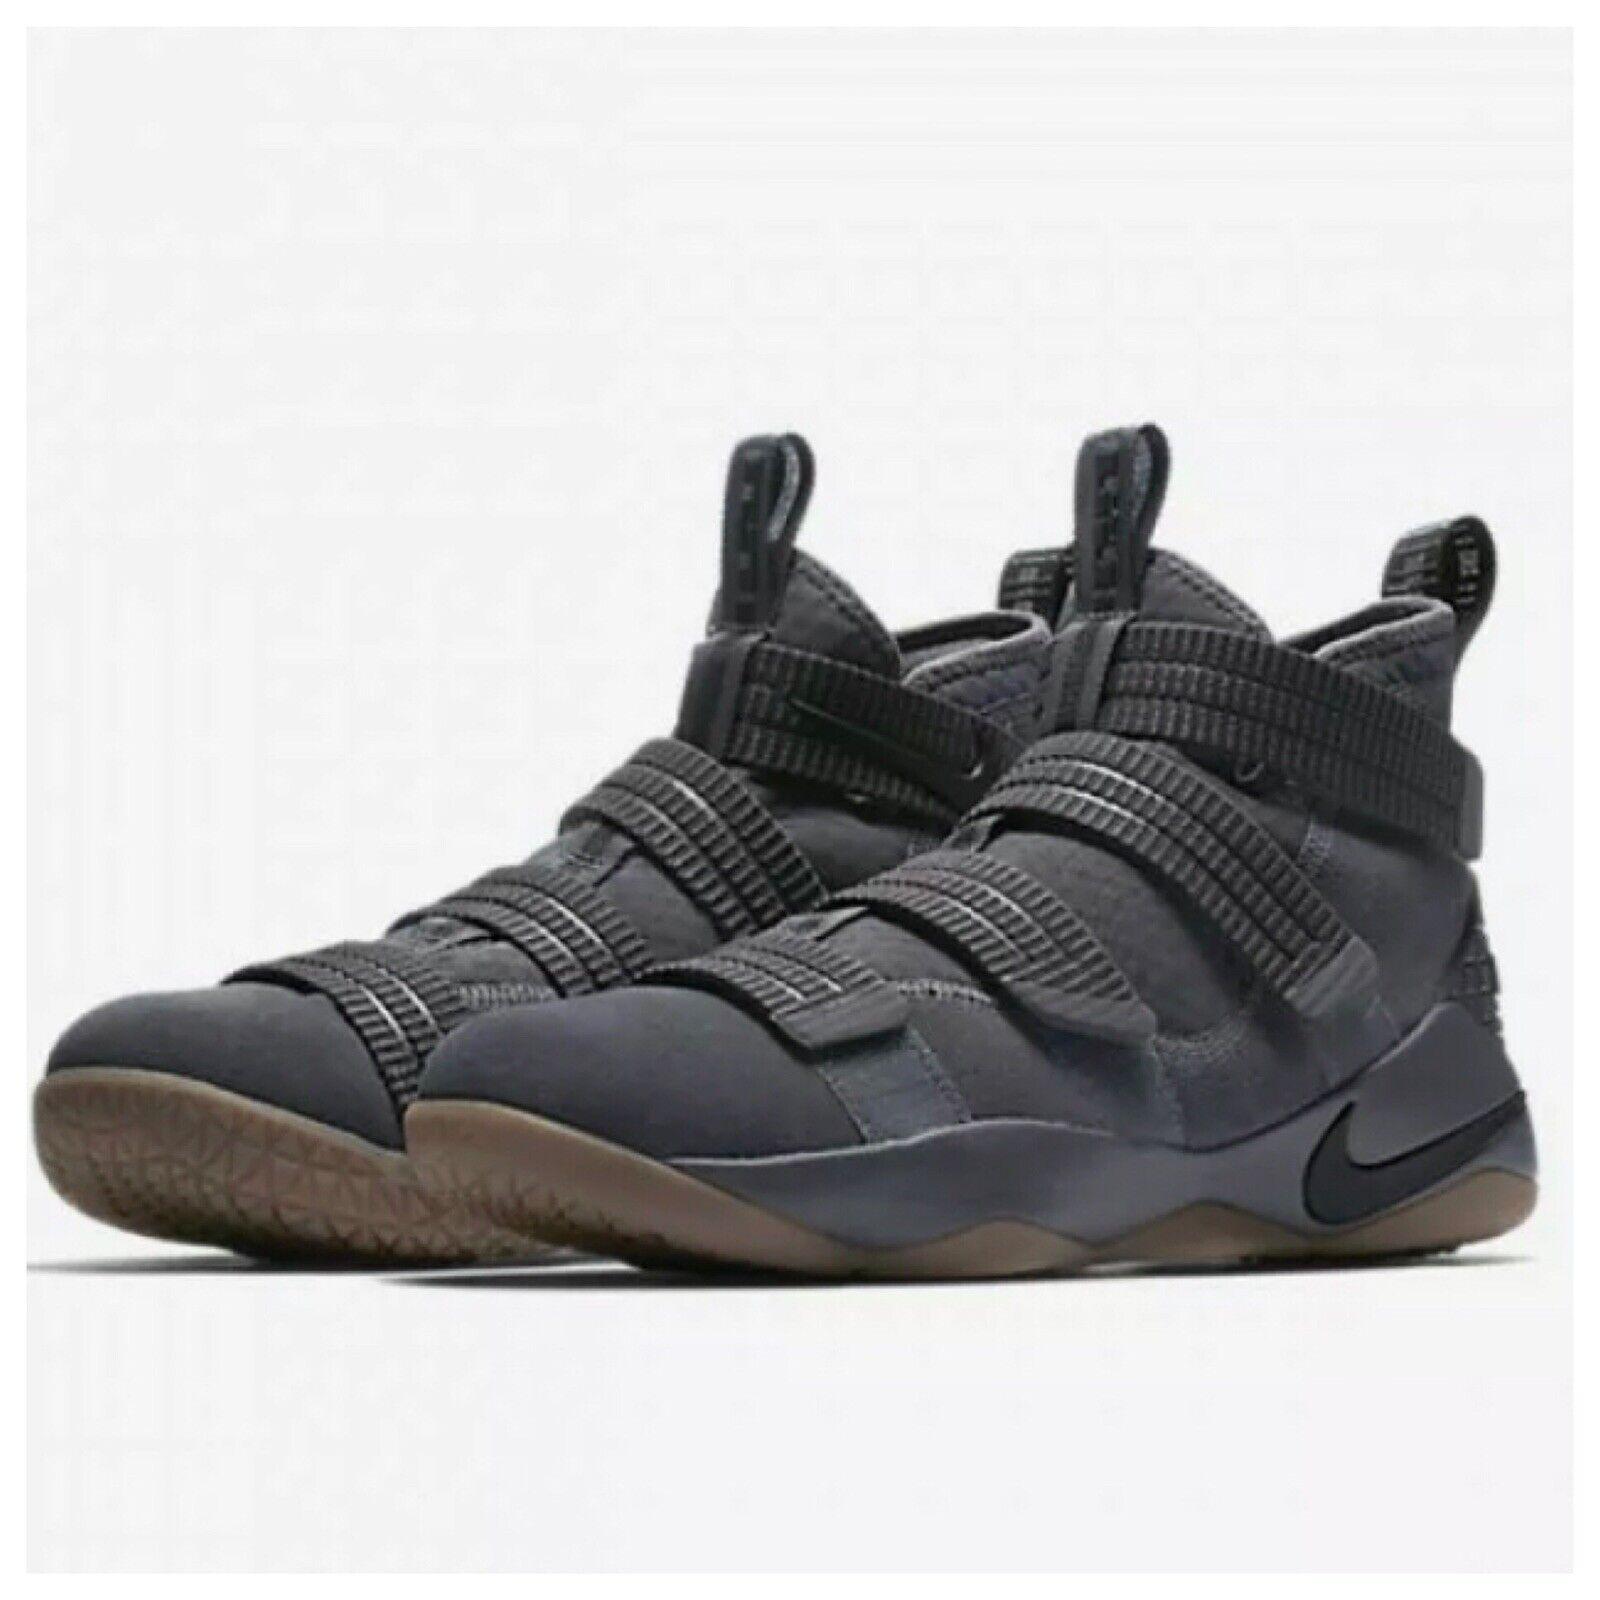 sale usa online buy popular fantastic savings Nike Lebron Soldier 11 Dark Grey Aqua 918369 003 Youth 7 for sale ...